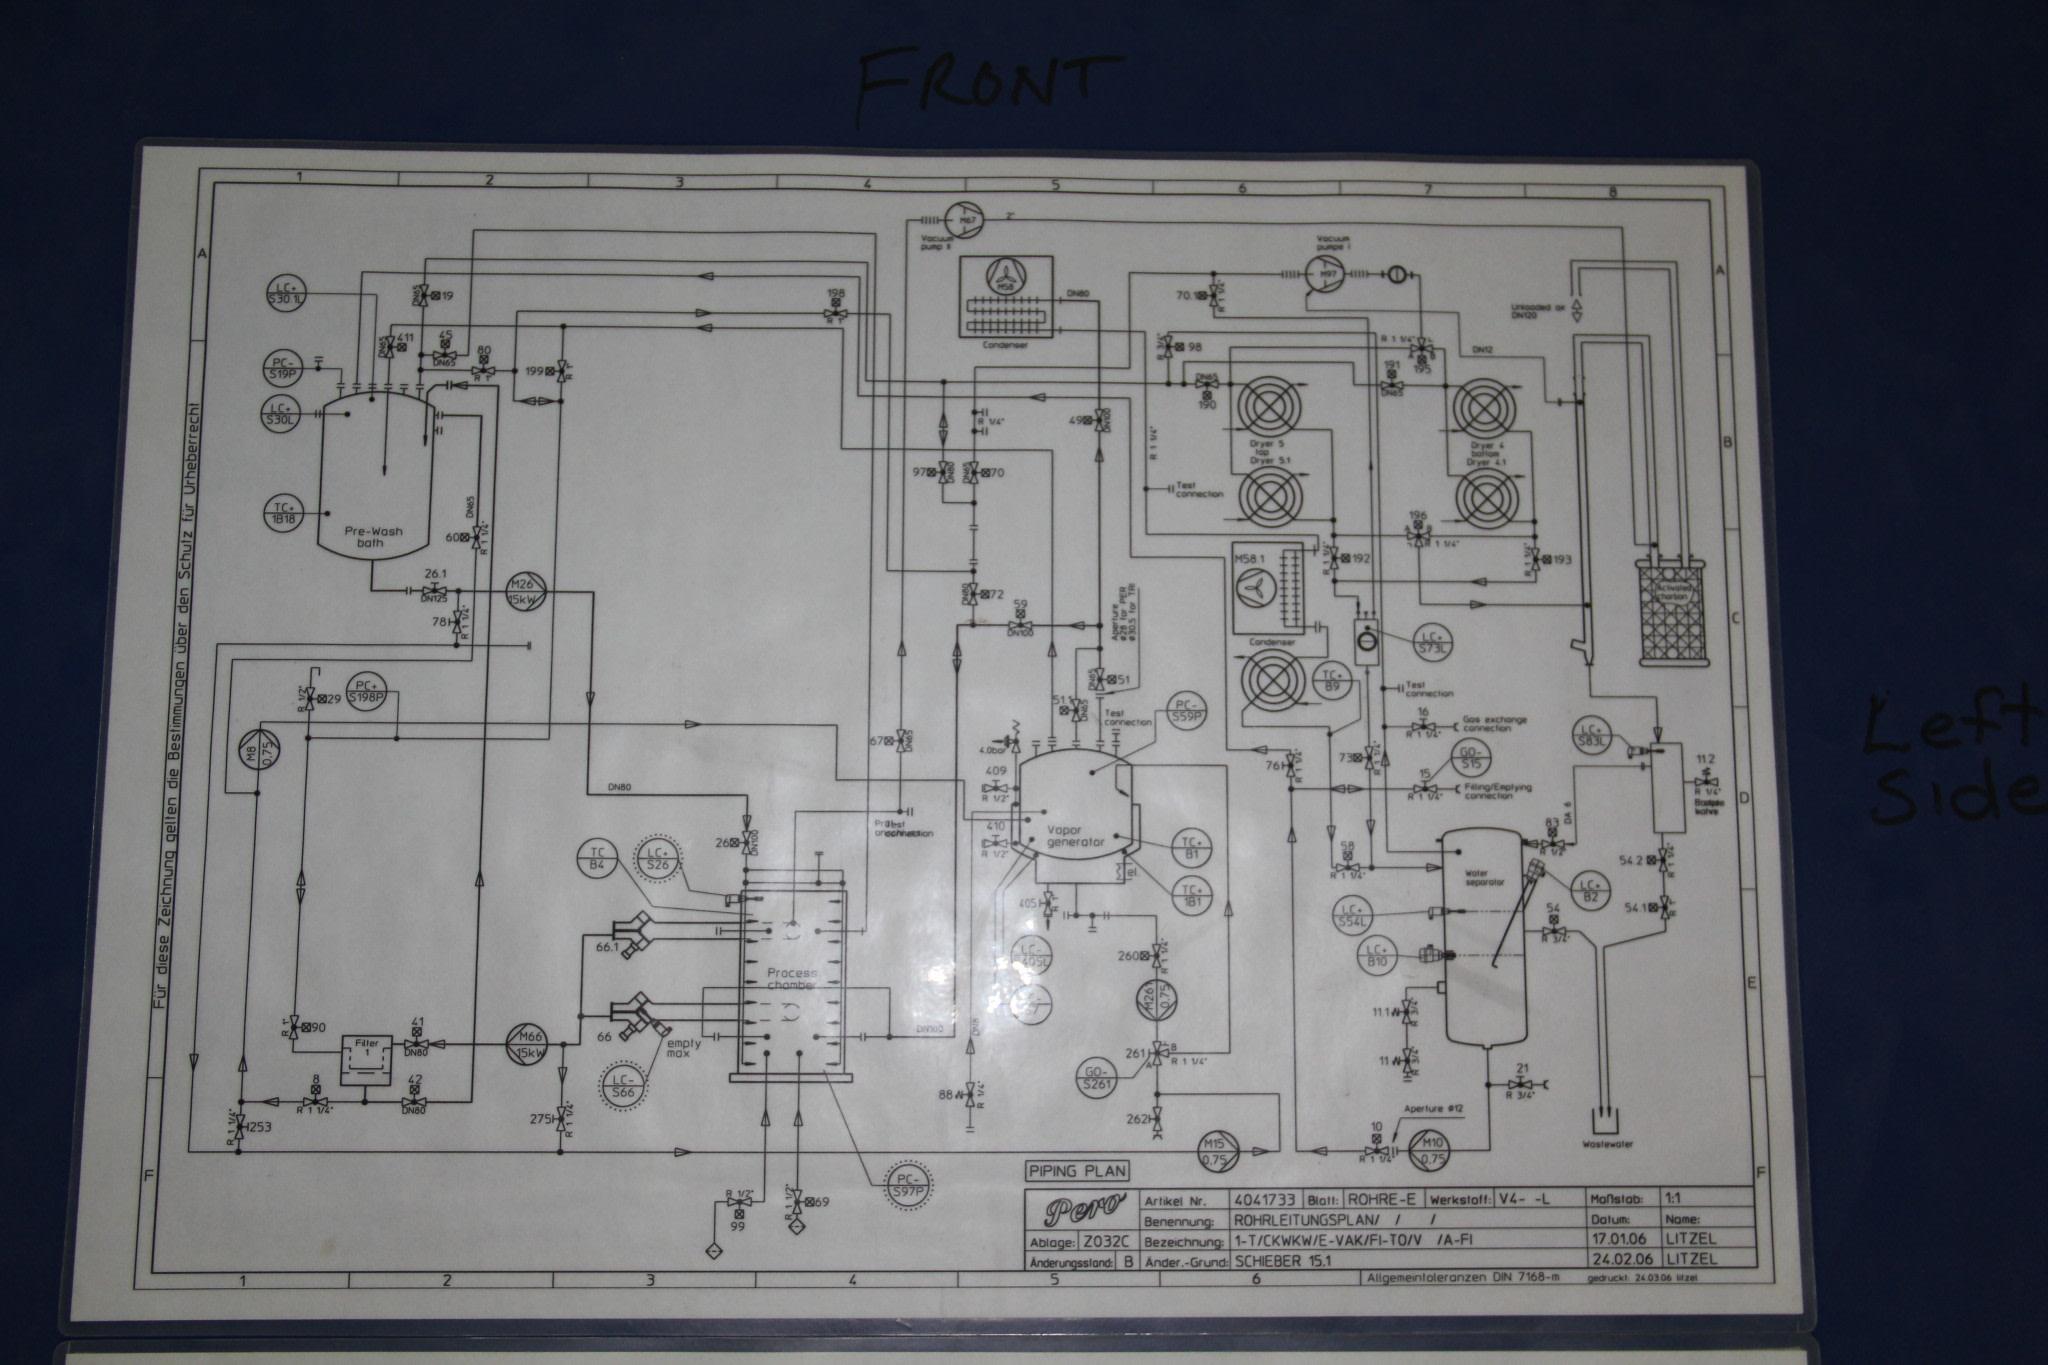 Rheem Fan Motor Wiring Diagram Design Kpi Cisco Networking Tools Ac Air Handler Nice Gallery The Best Electrical Circuit 1307 20 Kgjh5h